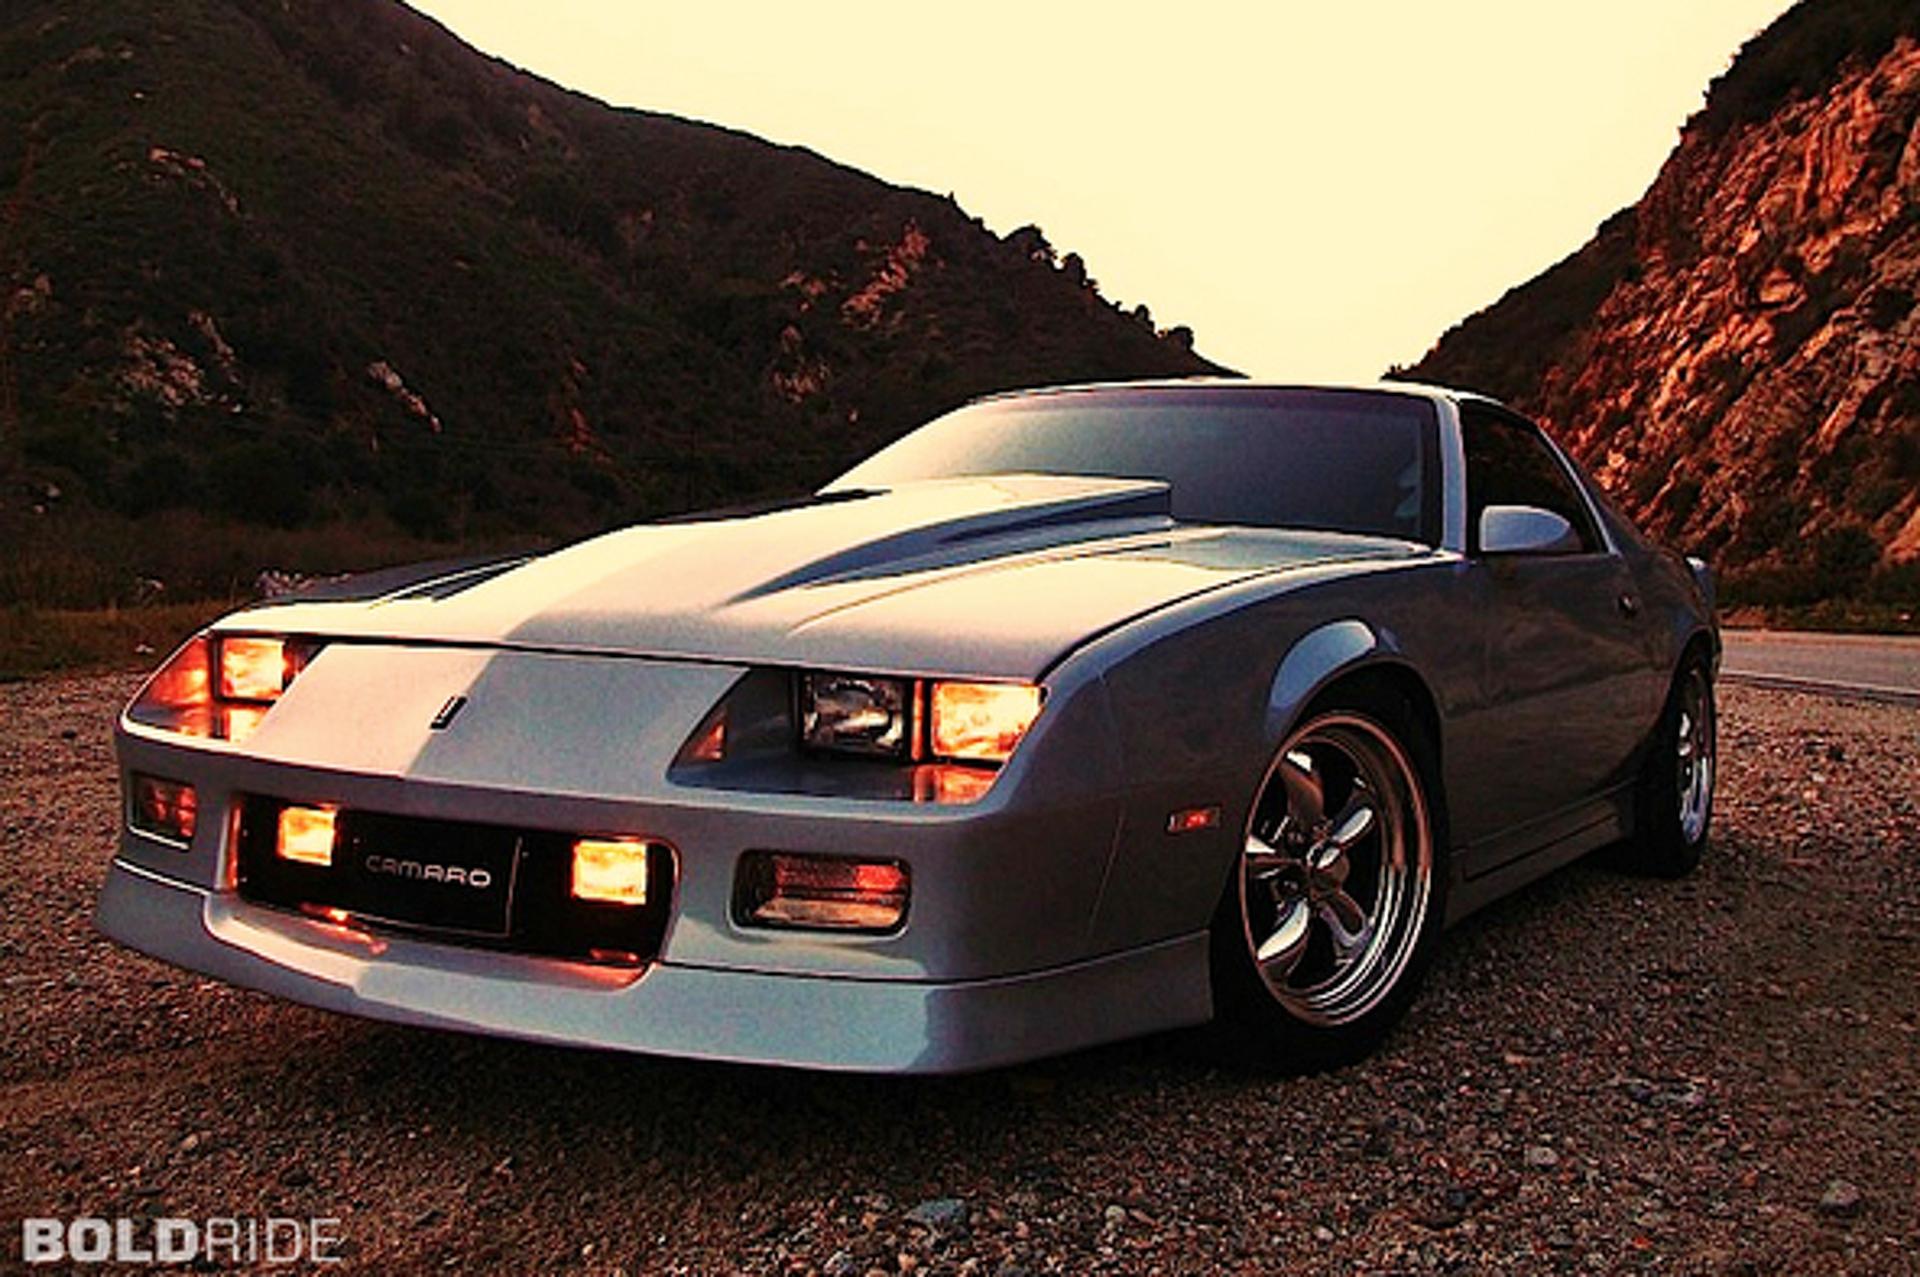 Camaro Iroc Z28 >> Your Ride 1989 Chevrolet Camaro Iroc Z28